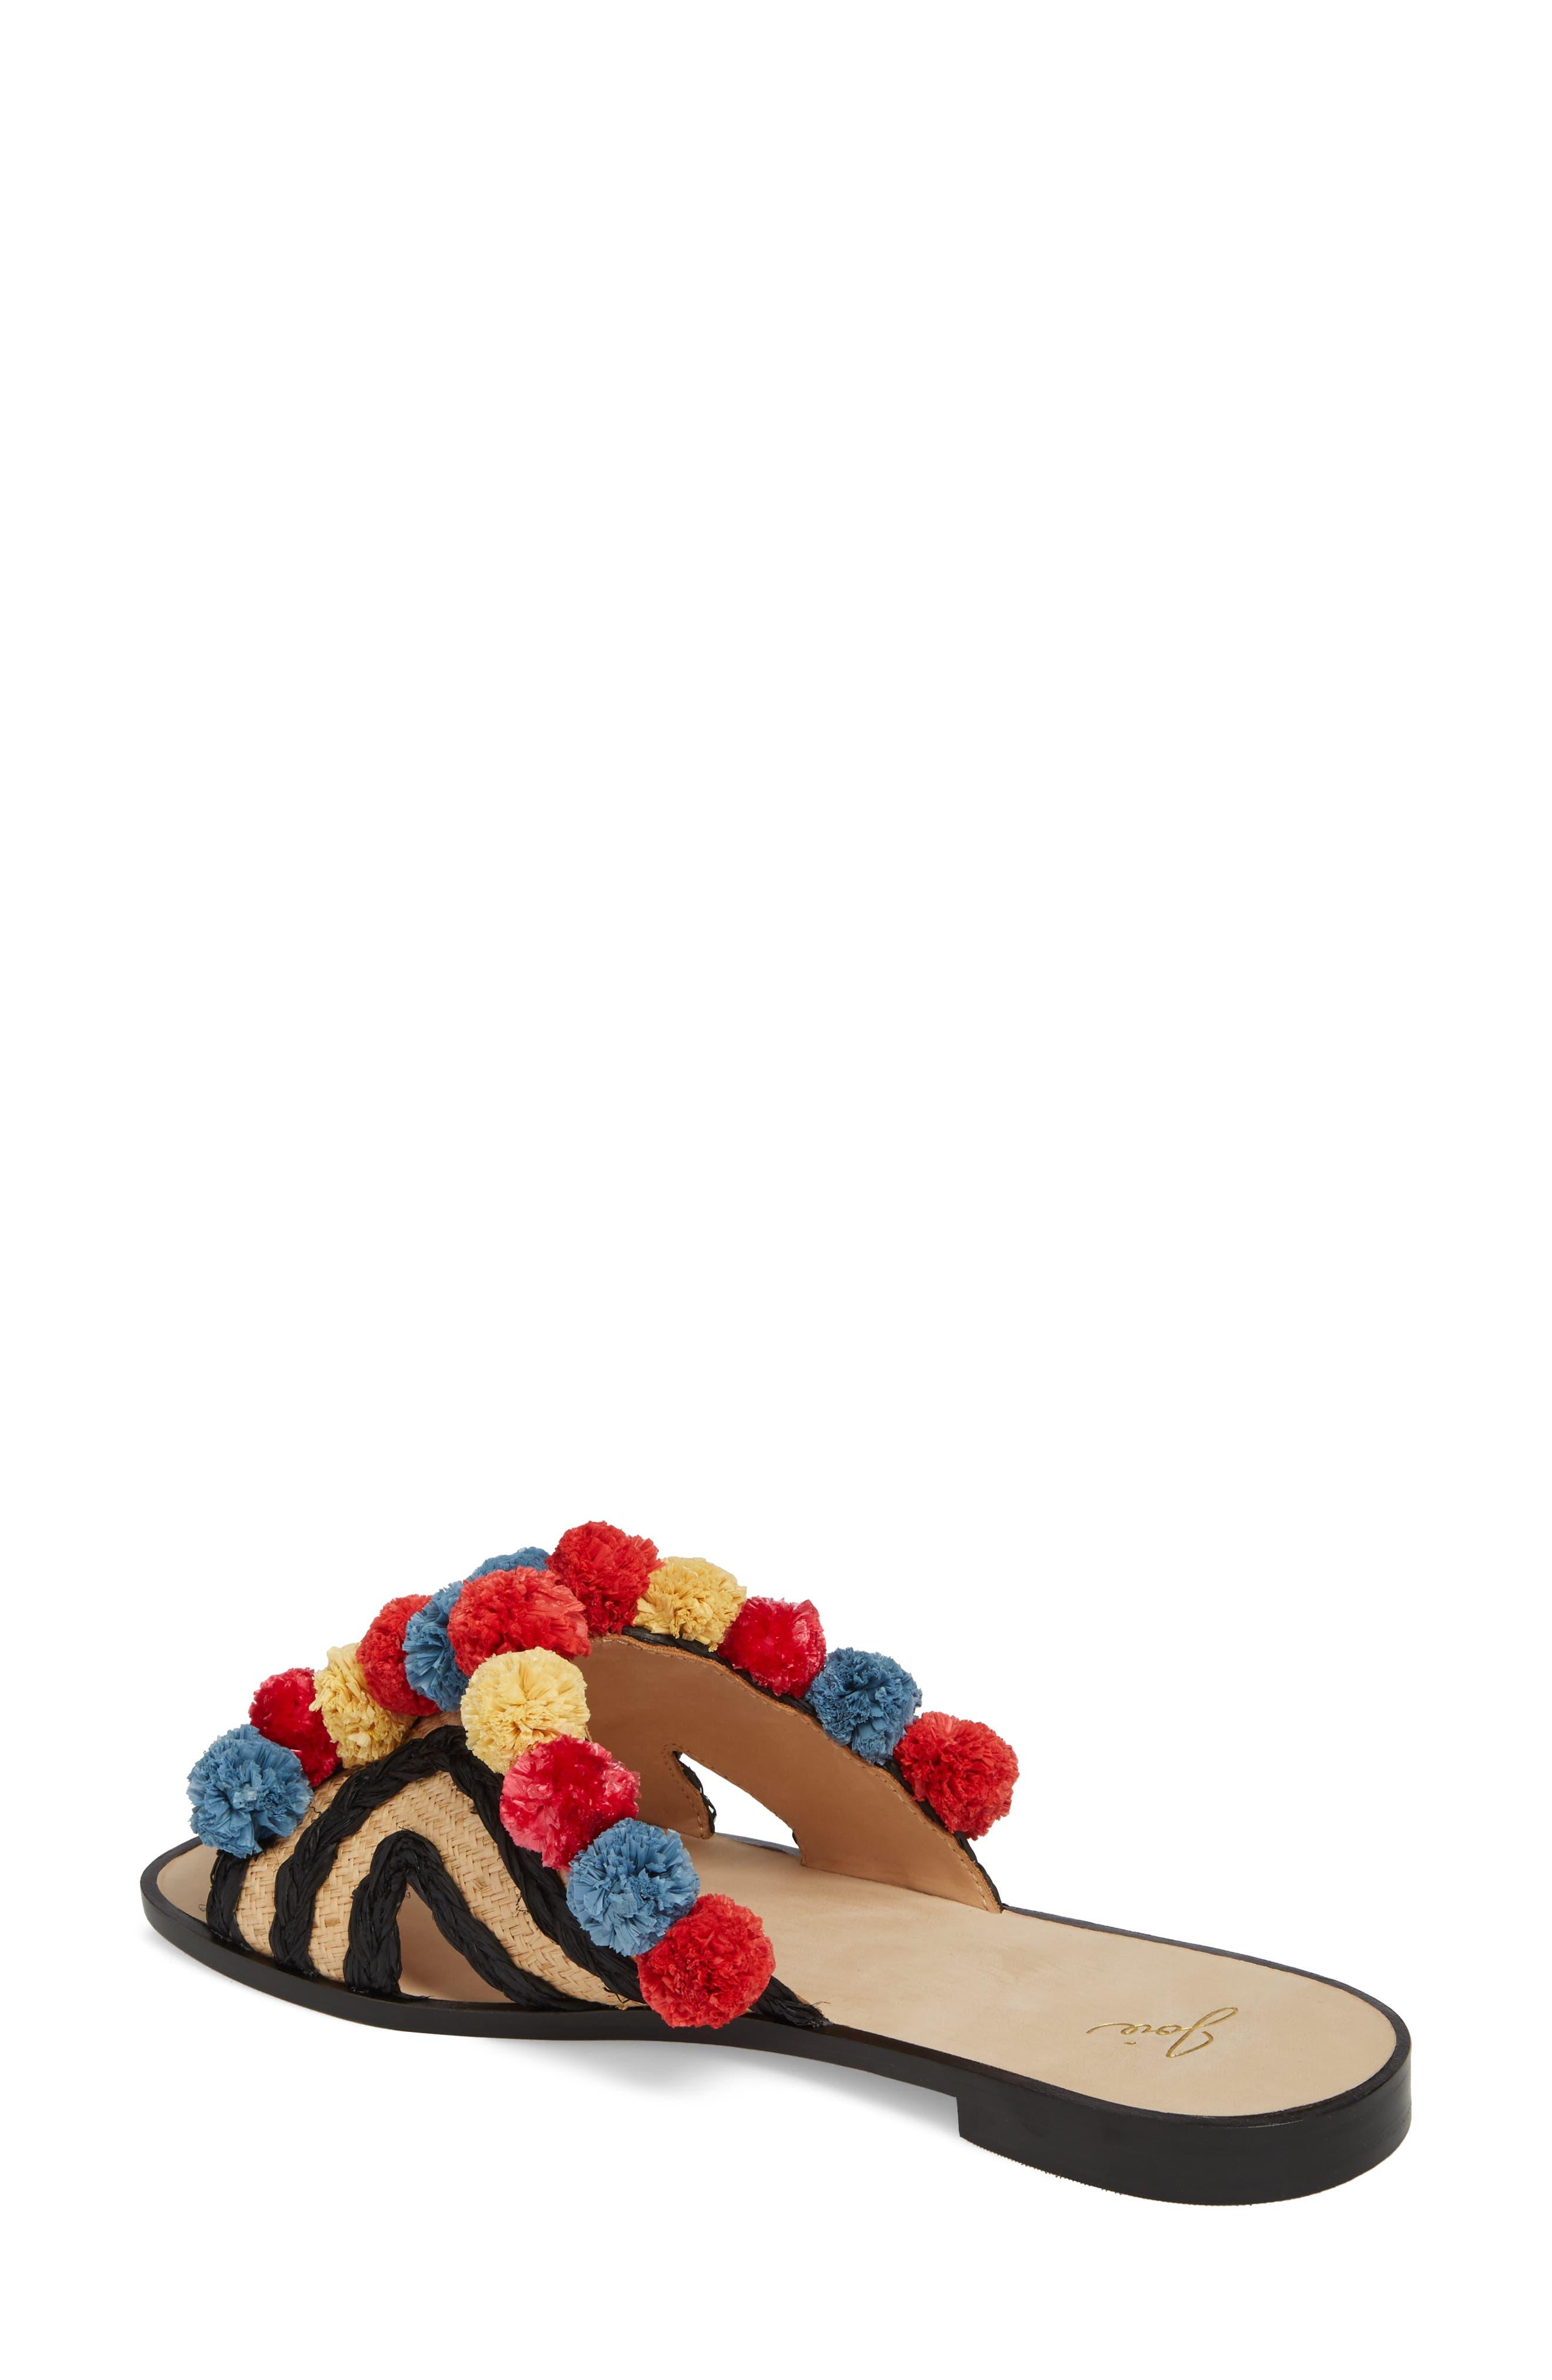 Paden Pompom Slide Sandals,                             Alternate thumbnail 2, color,                             Multi